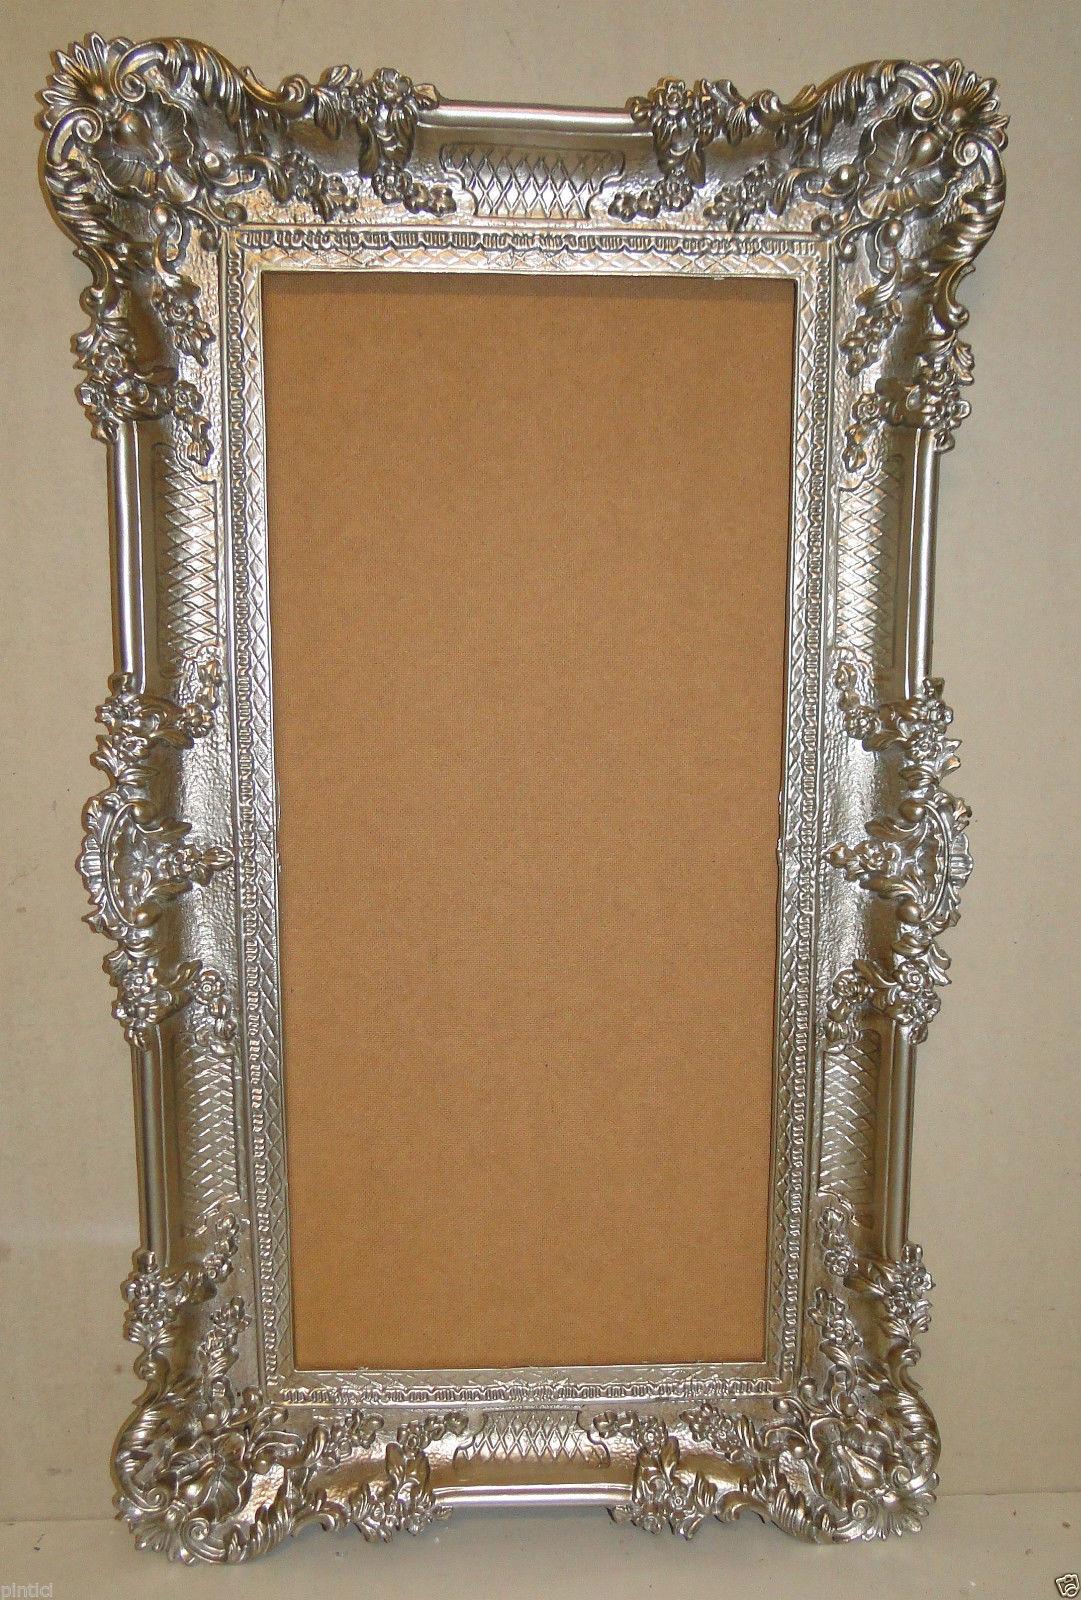 bilderrahmen antik silber 96x57 spiegelrahmen. Black Bedroom Furniture Sets. Home Design Ideas